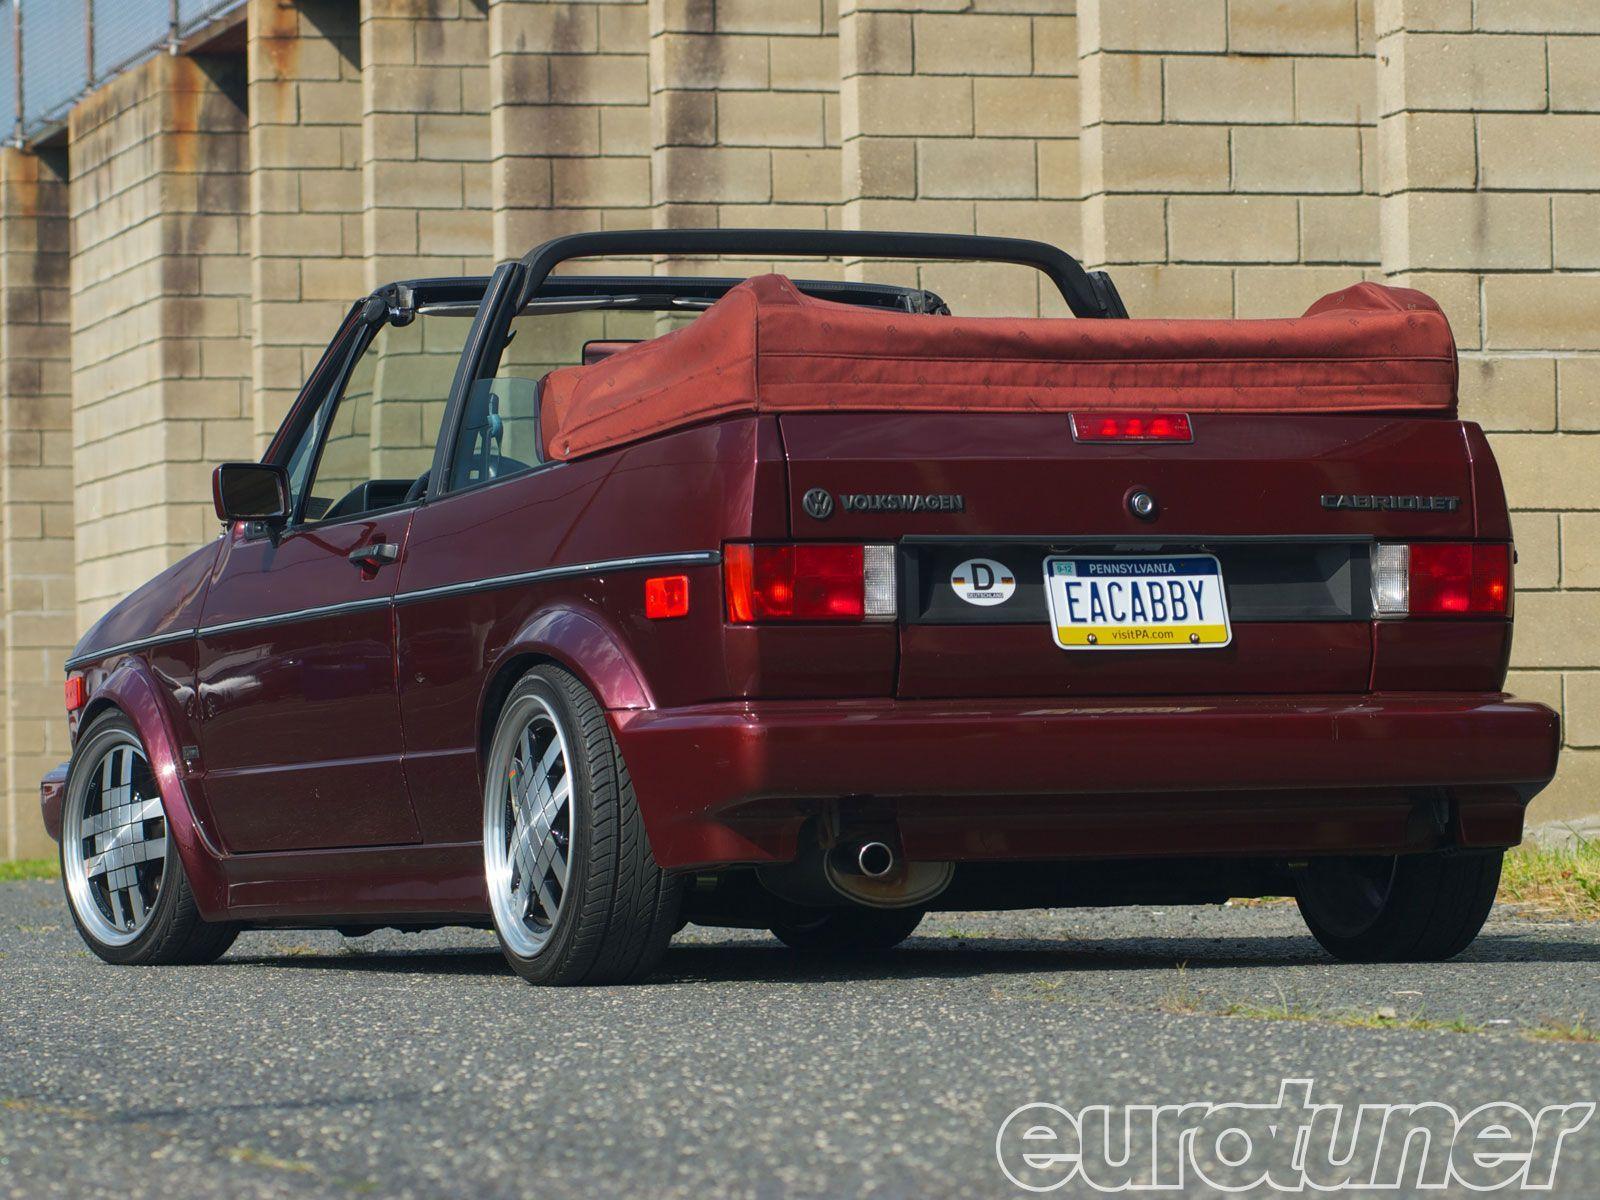 Epcp 1209 02 1991 vw cabriolet etienne aigner edition rear view